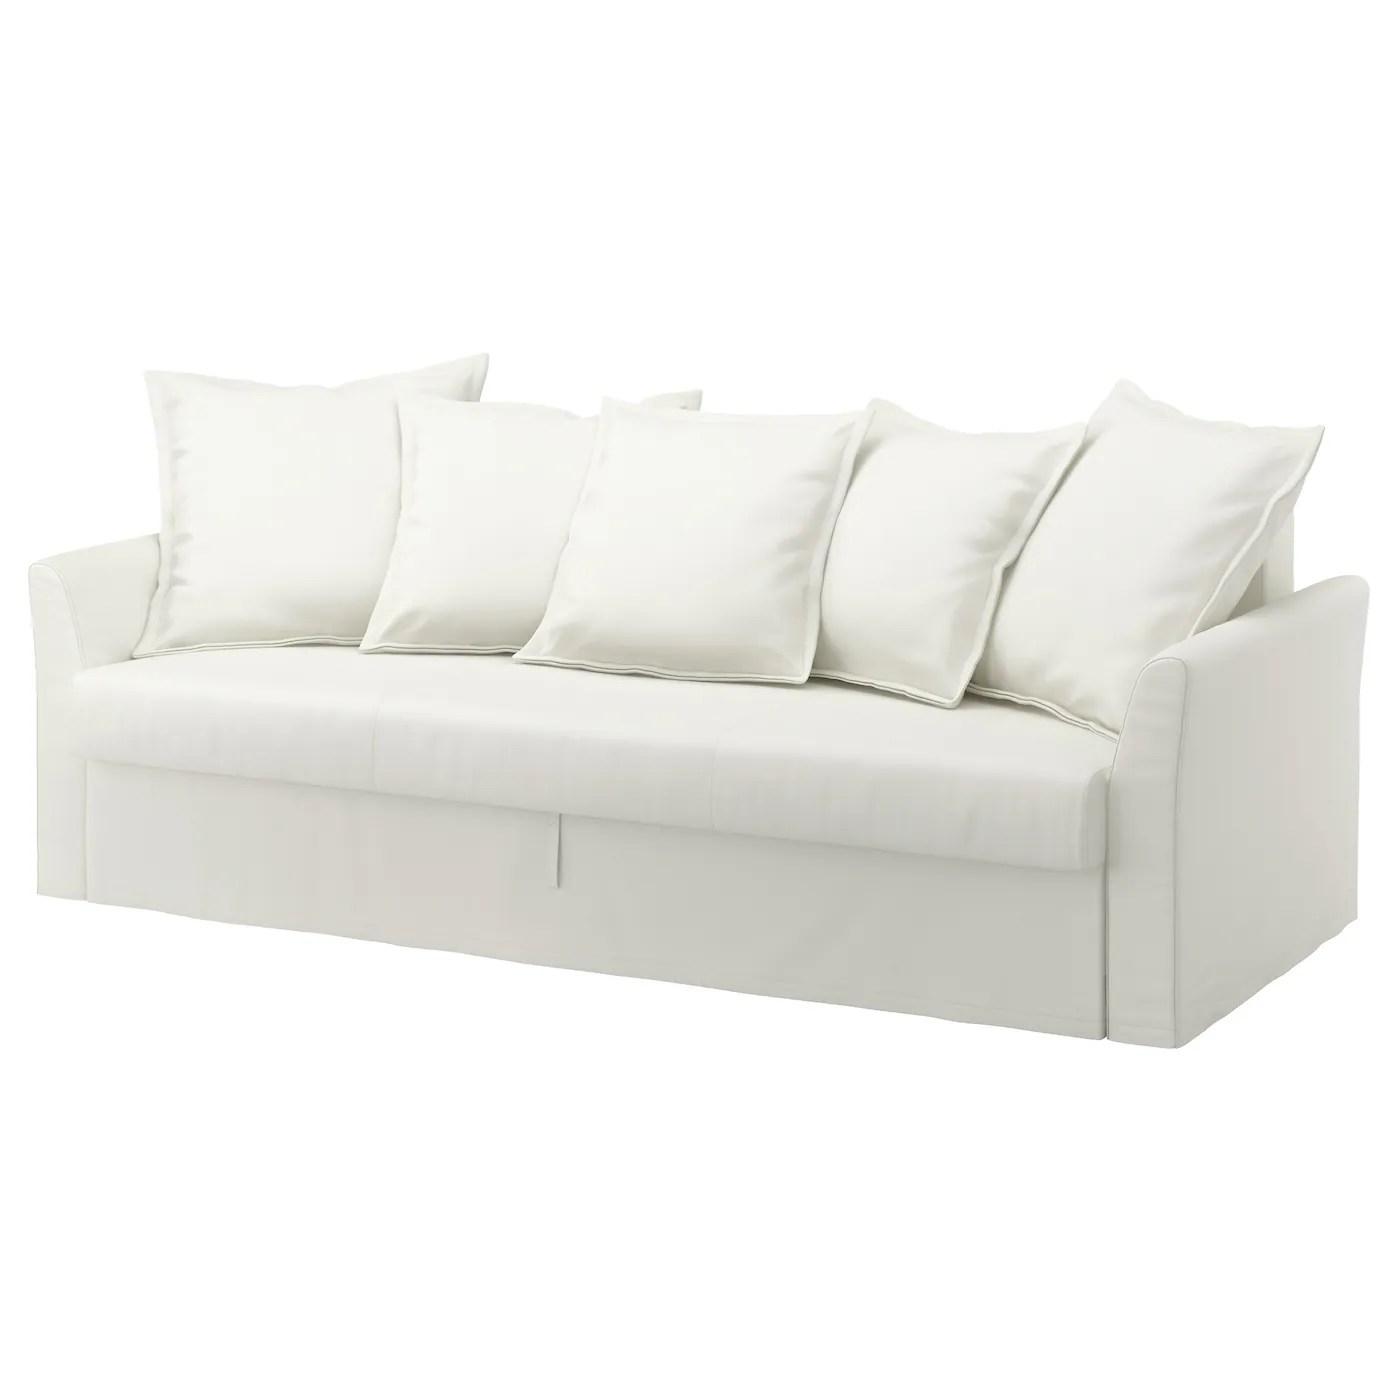 sofa chair bed ikea white covers cheap holmsund three seat ransta